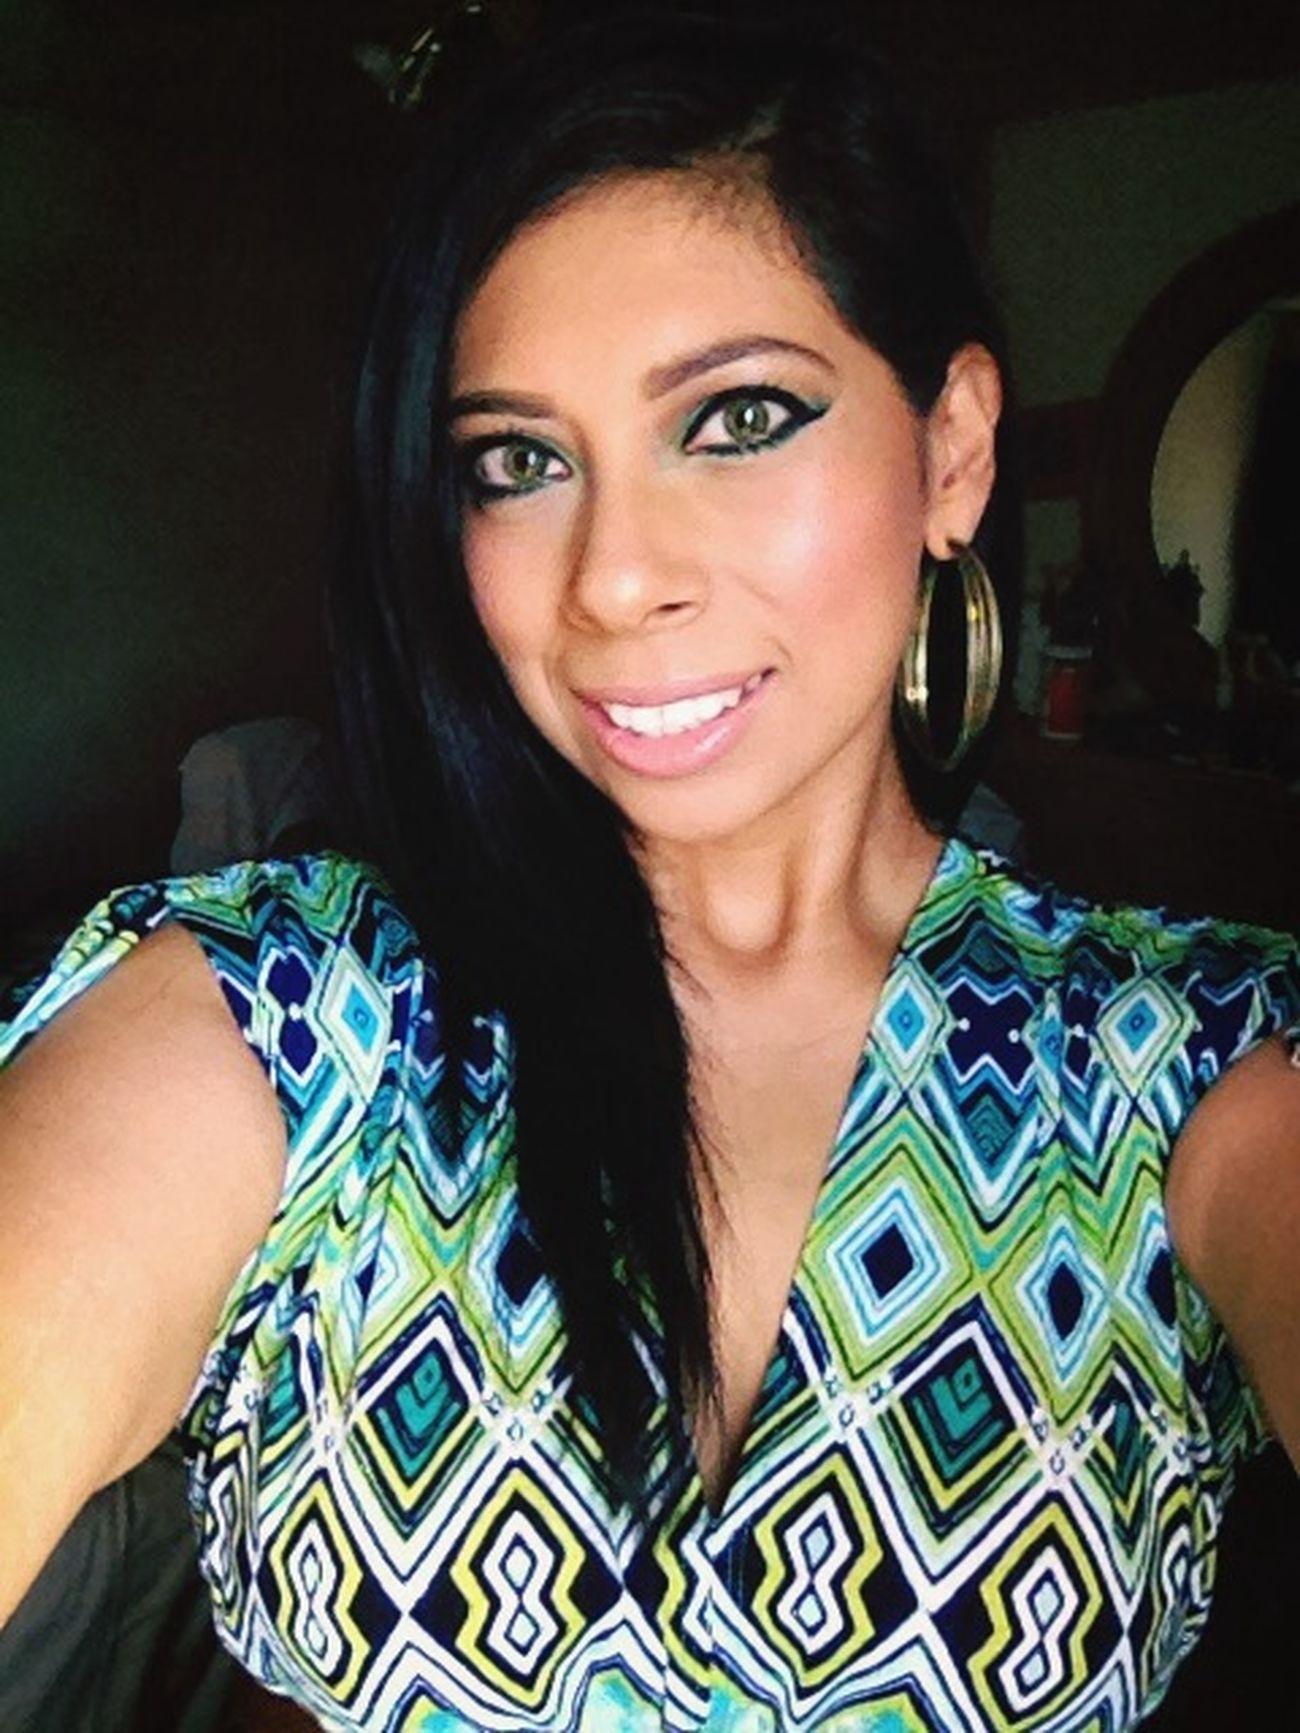 Selfie ✌ Eye #eyeshadow #eyelashes #eyebrows #instabeauty Simply Me ❤